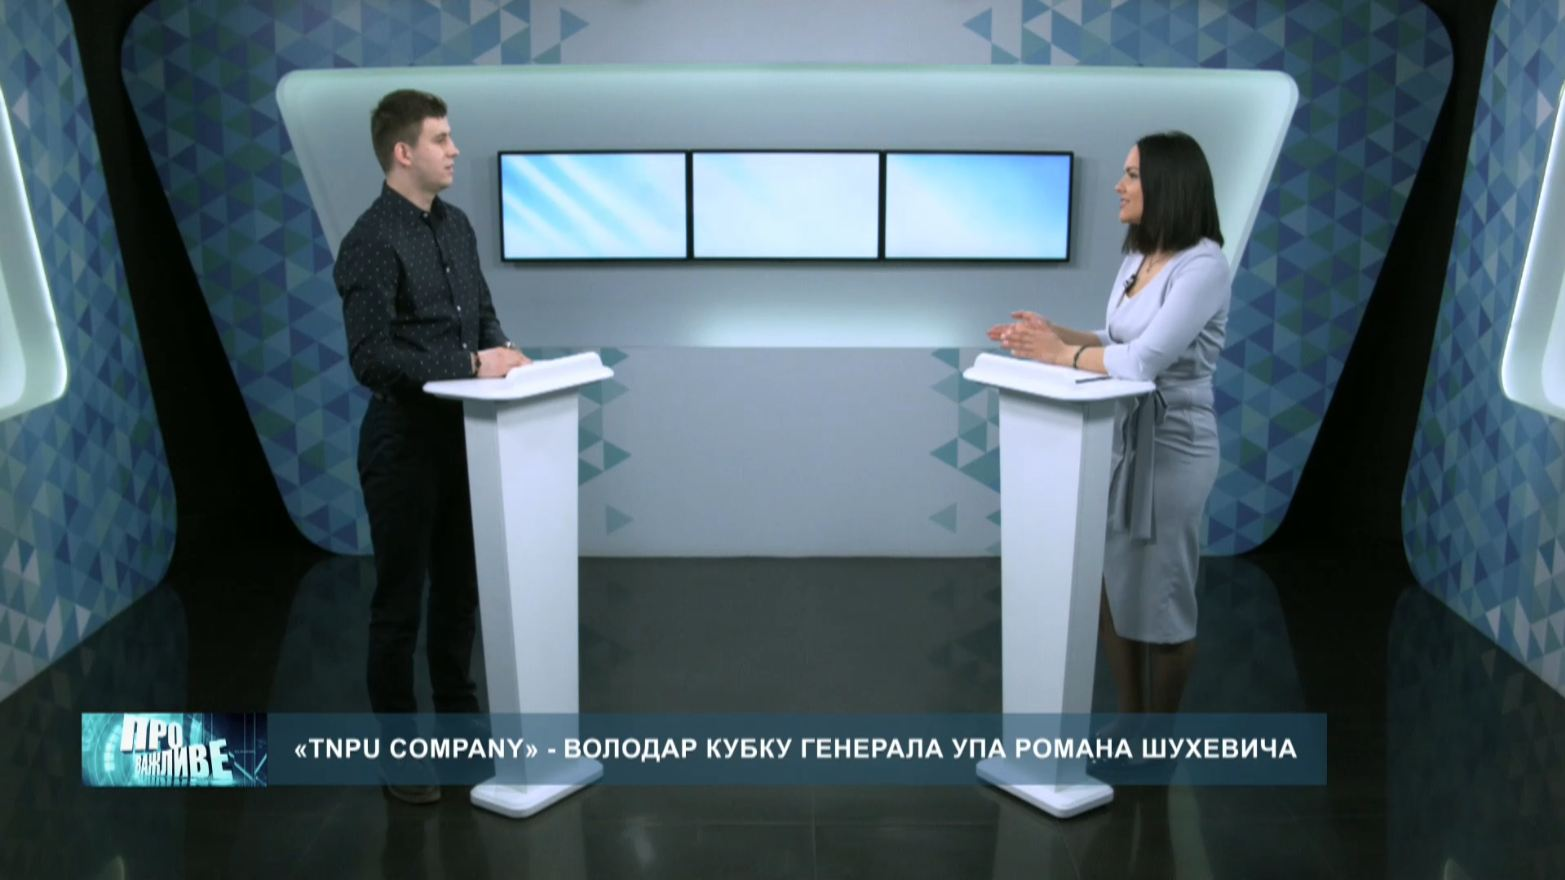 «Про важливе». «TNPU COMPANY» – володар кубку генерала УПА Романа Шухевича